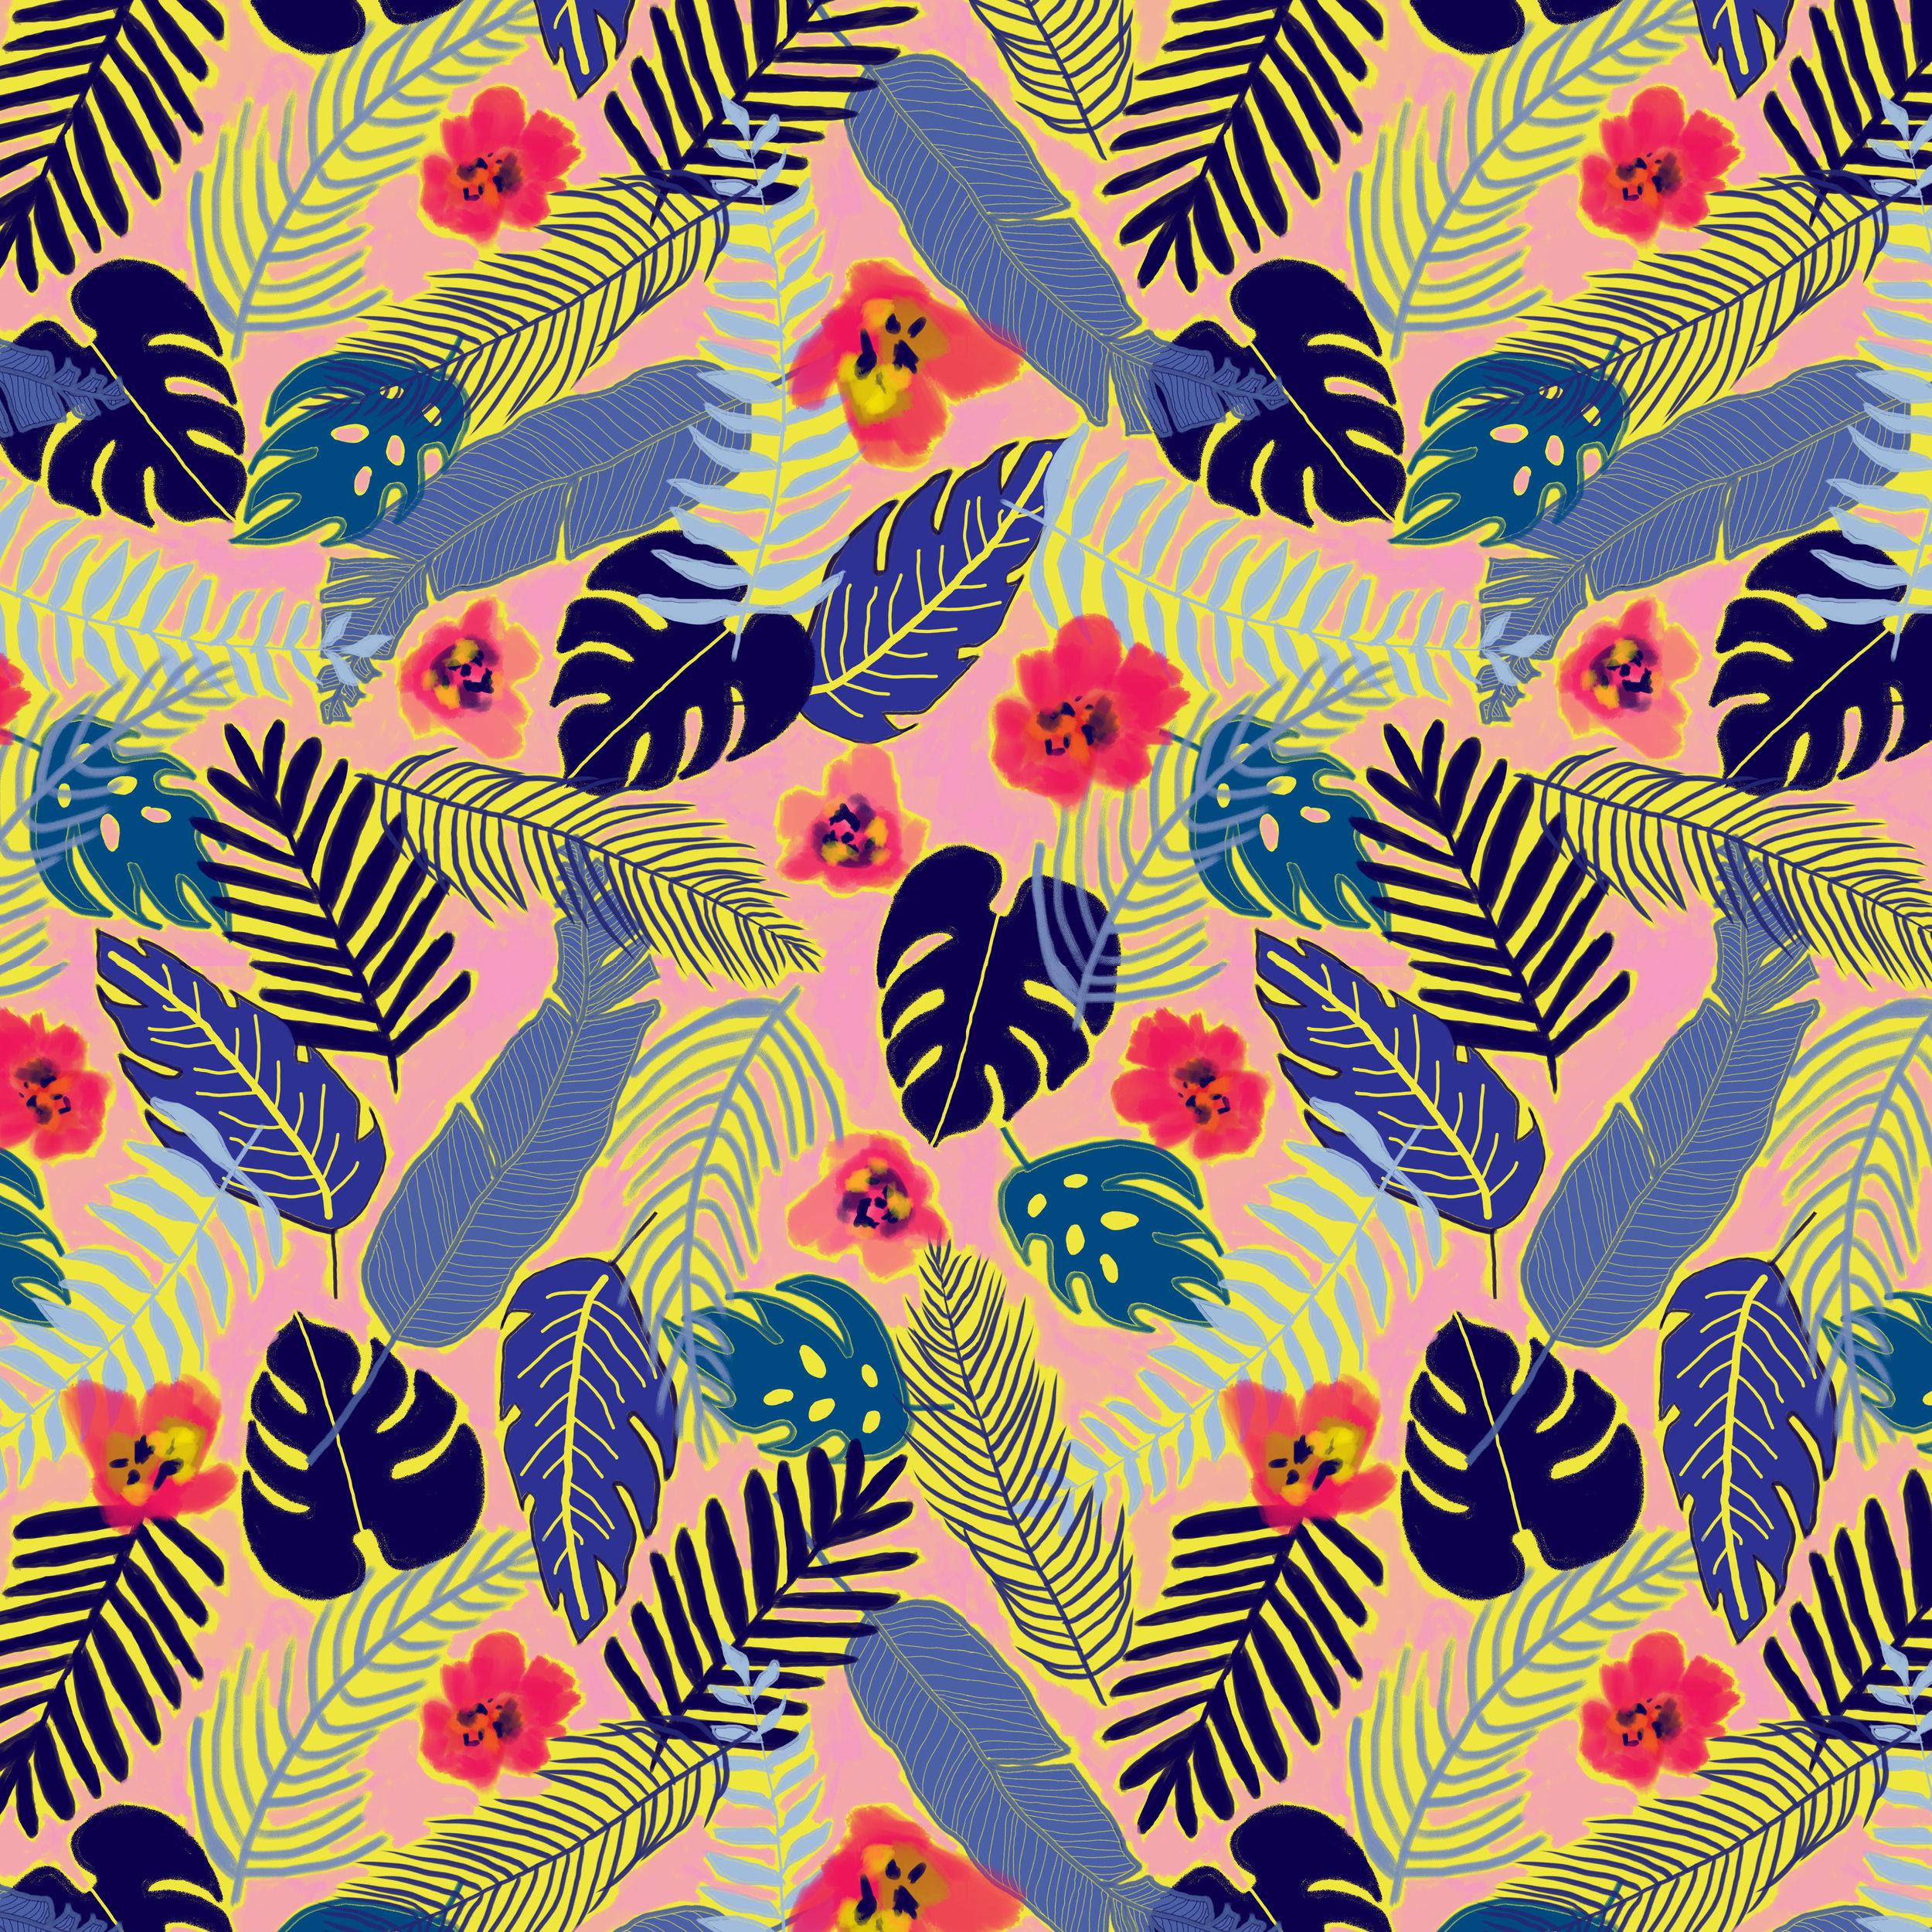 neon tropics-01.jpg